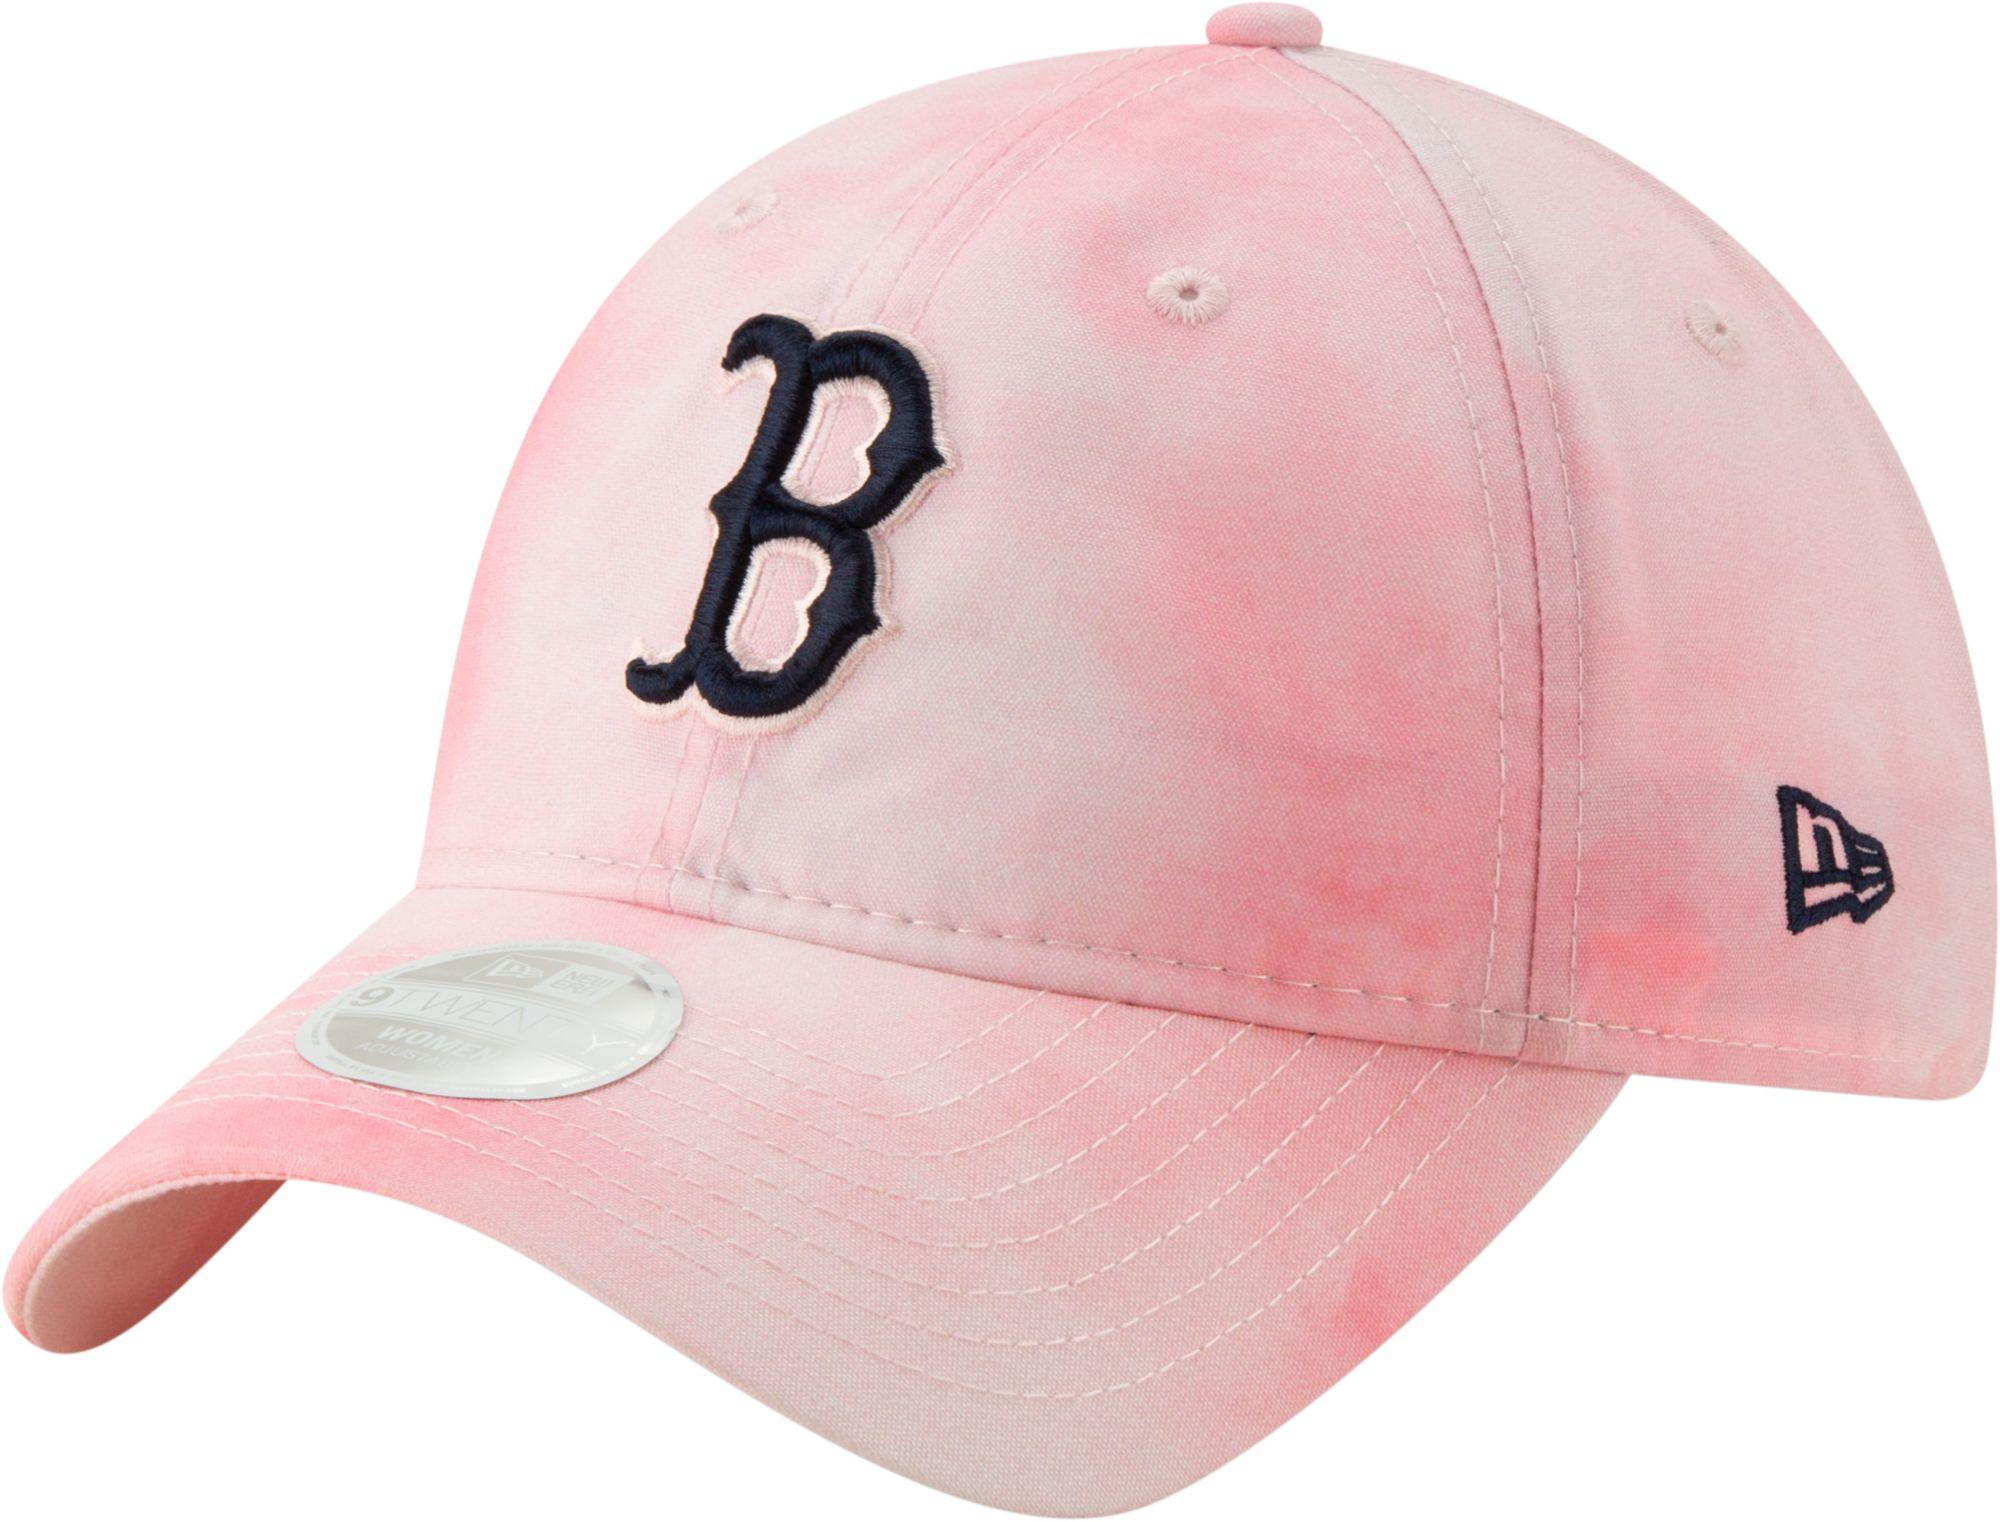 5e44c377bcf New Era Women s Boston Red Sox 9Twenty 2019 Mother s Day Adjustable Hat